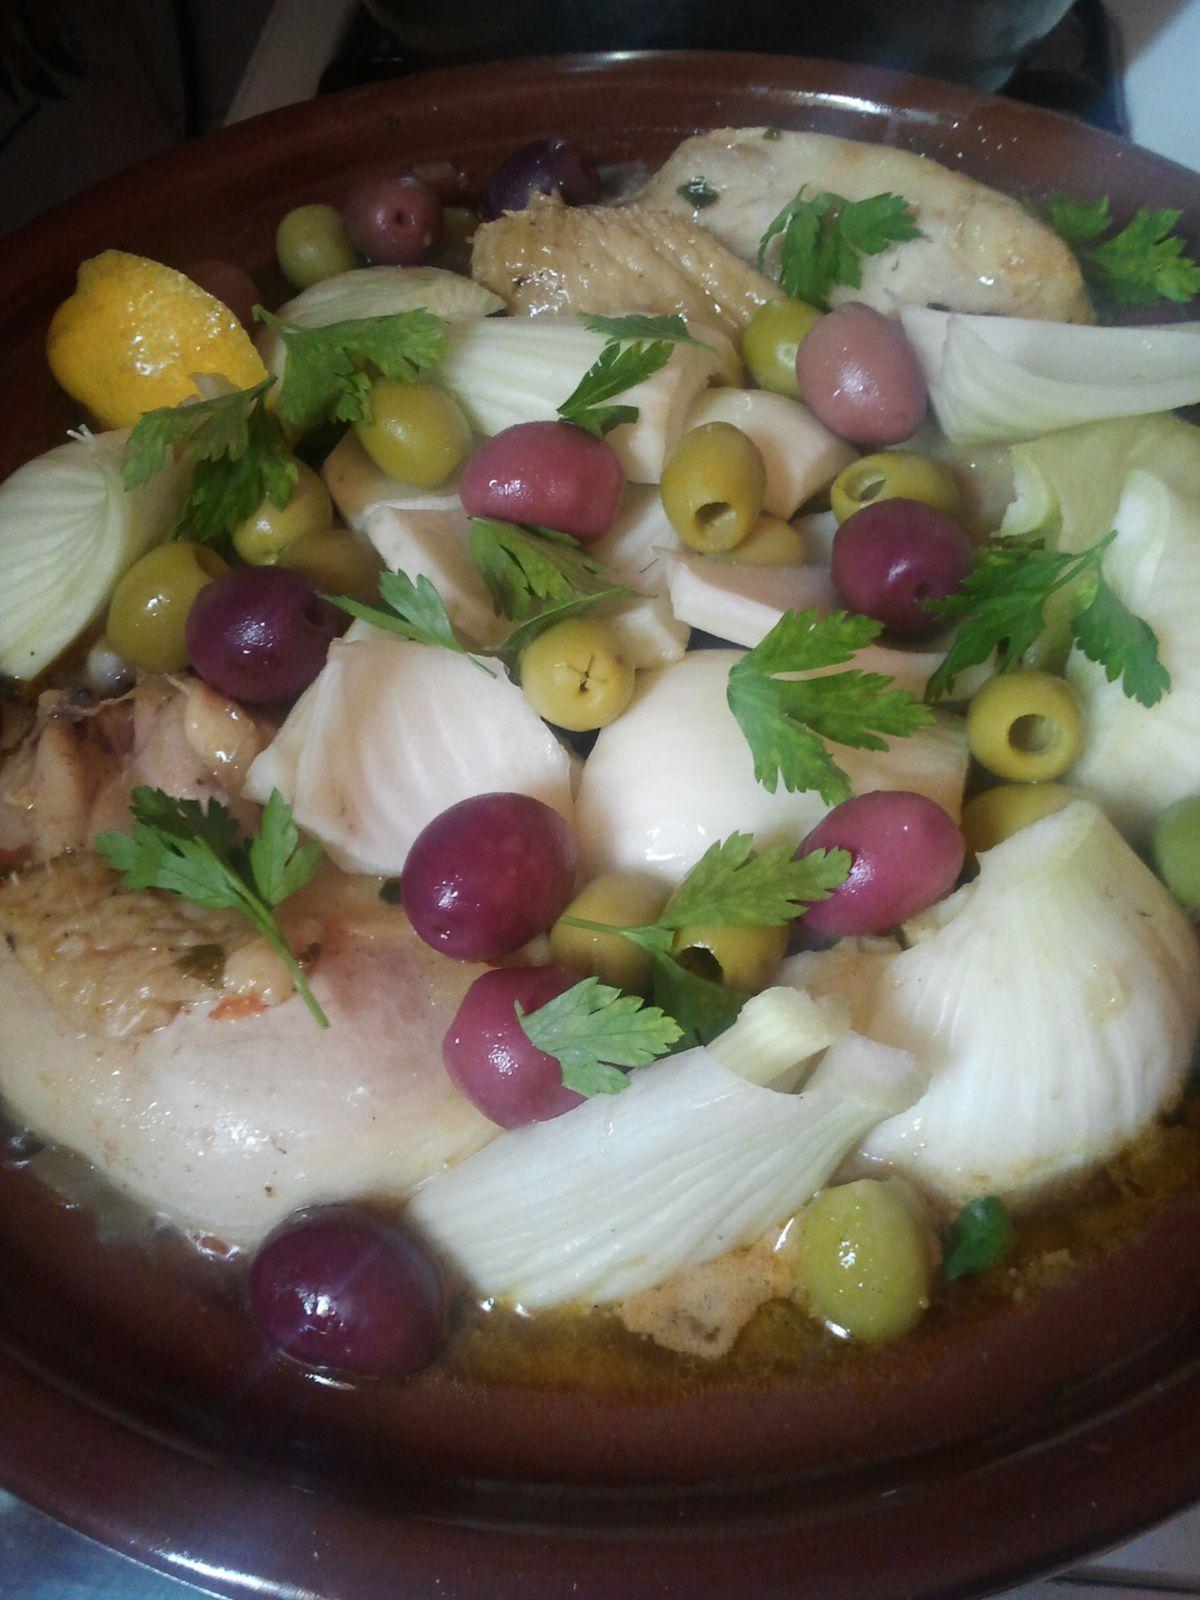 tajine besbess (tajine au fenouil et olives)